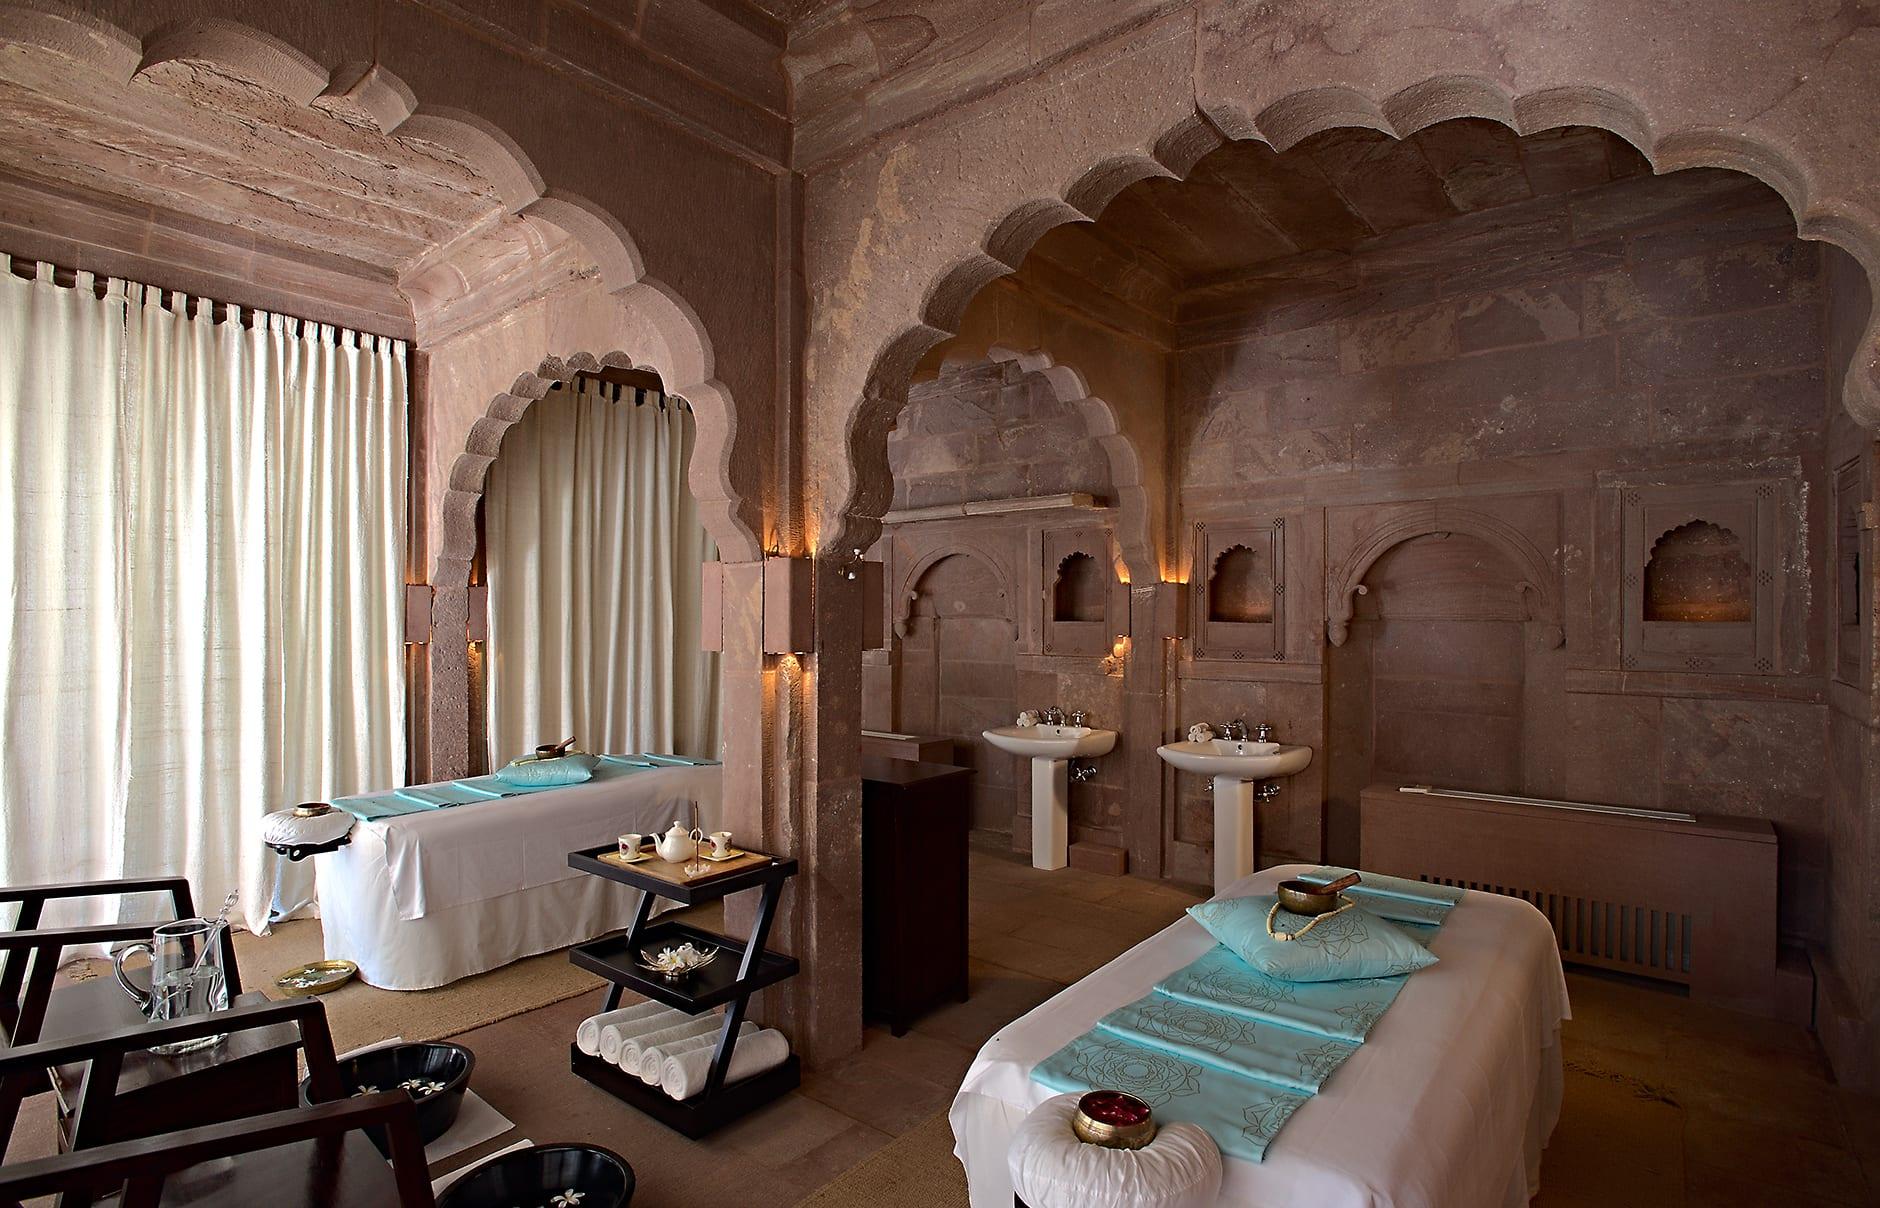 Spa treatment room. Raas Jodhpur, India. © Rass